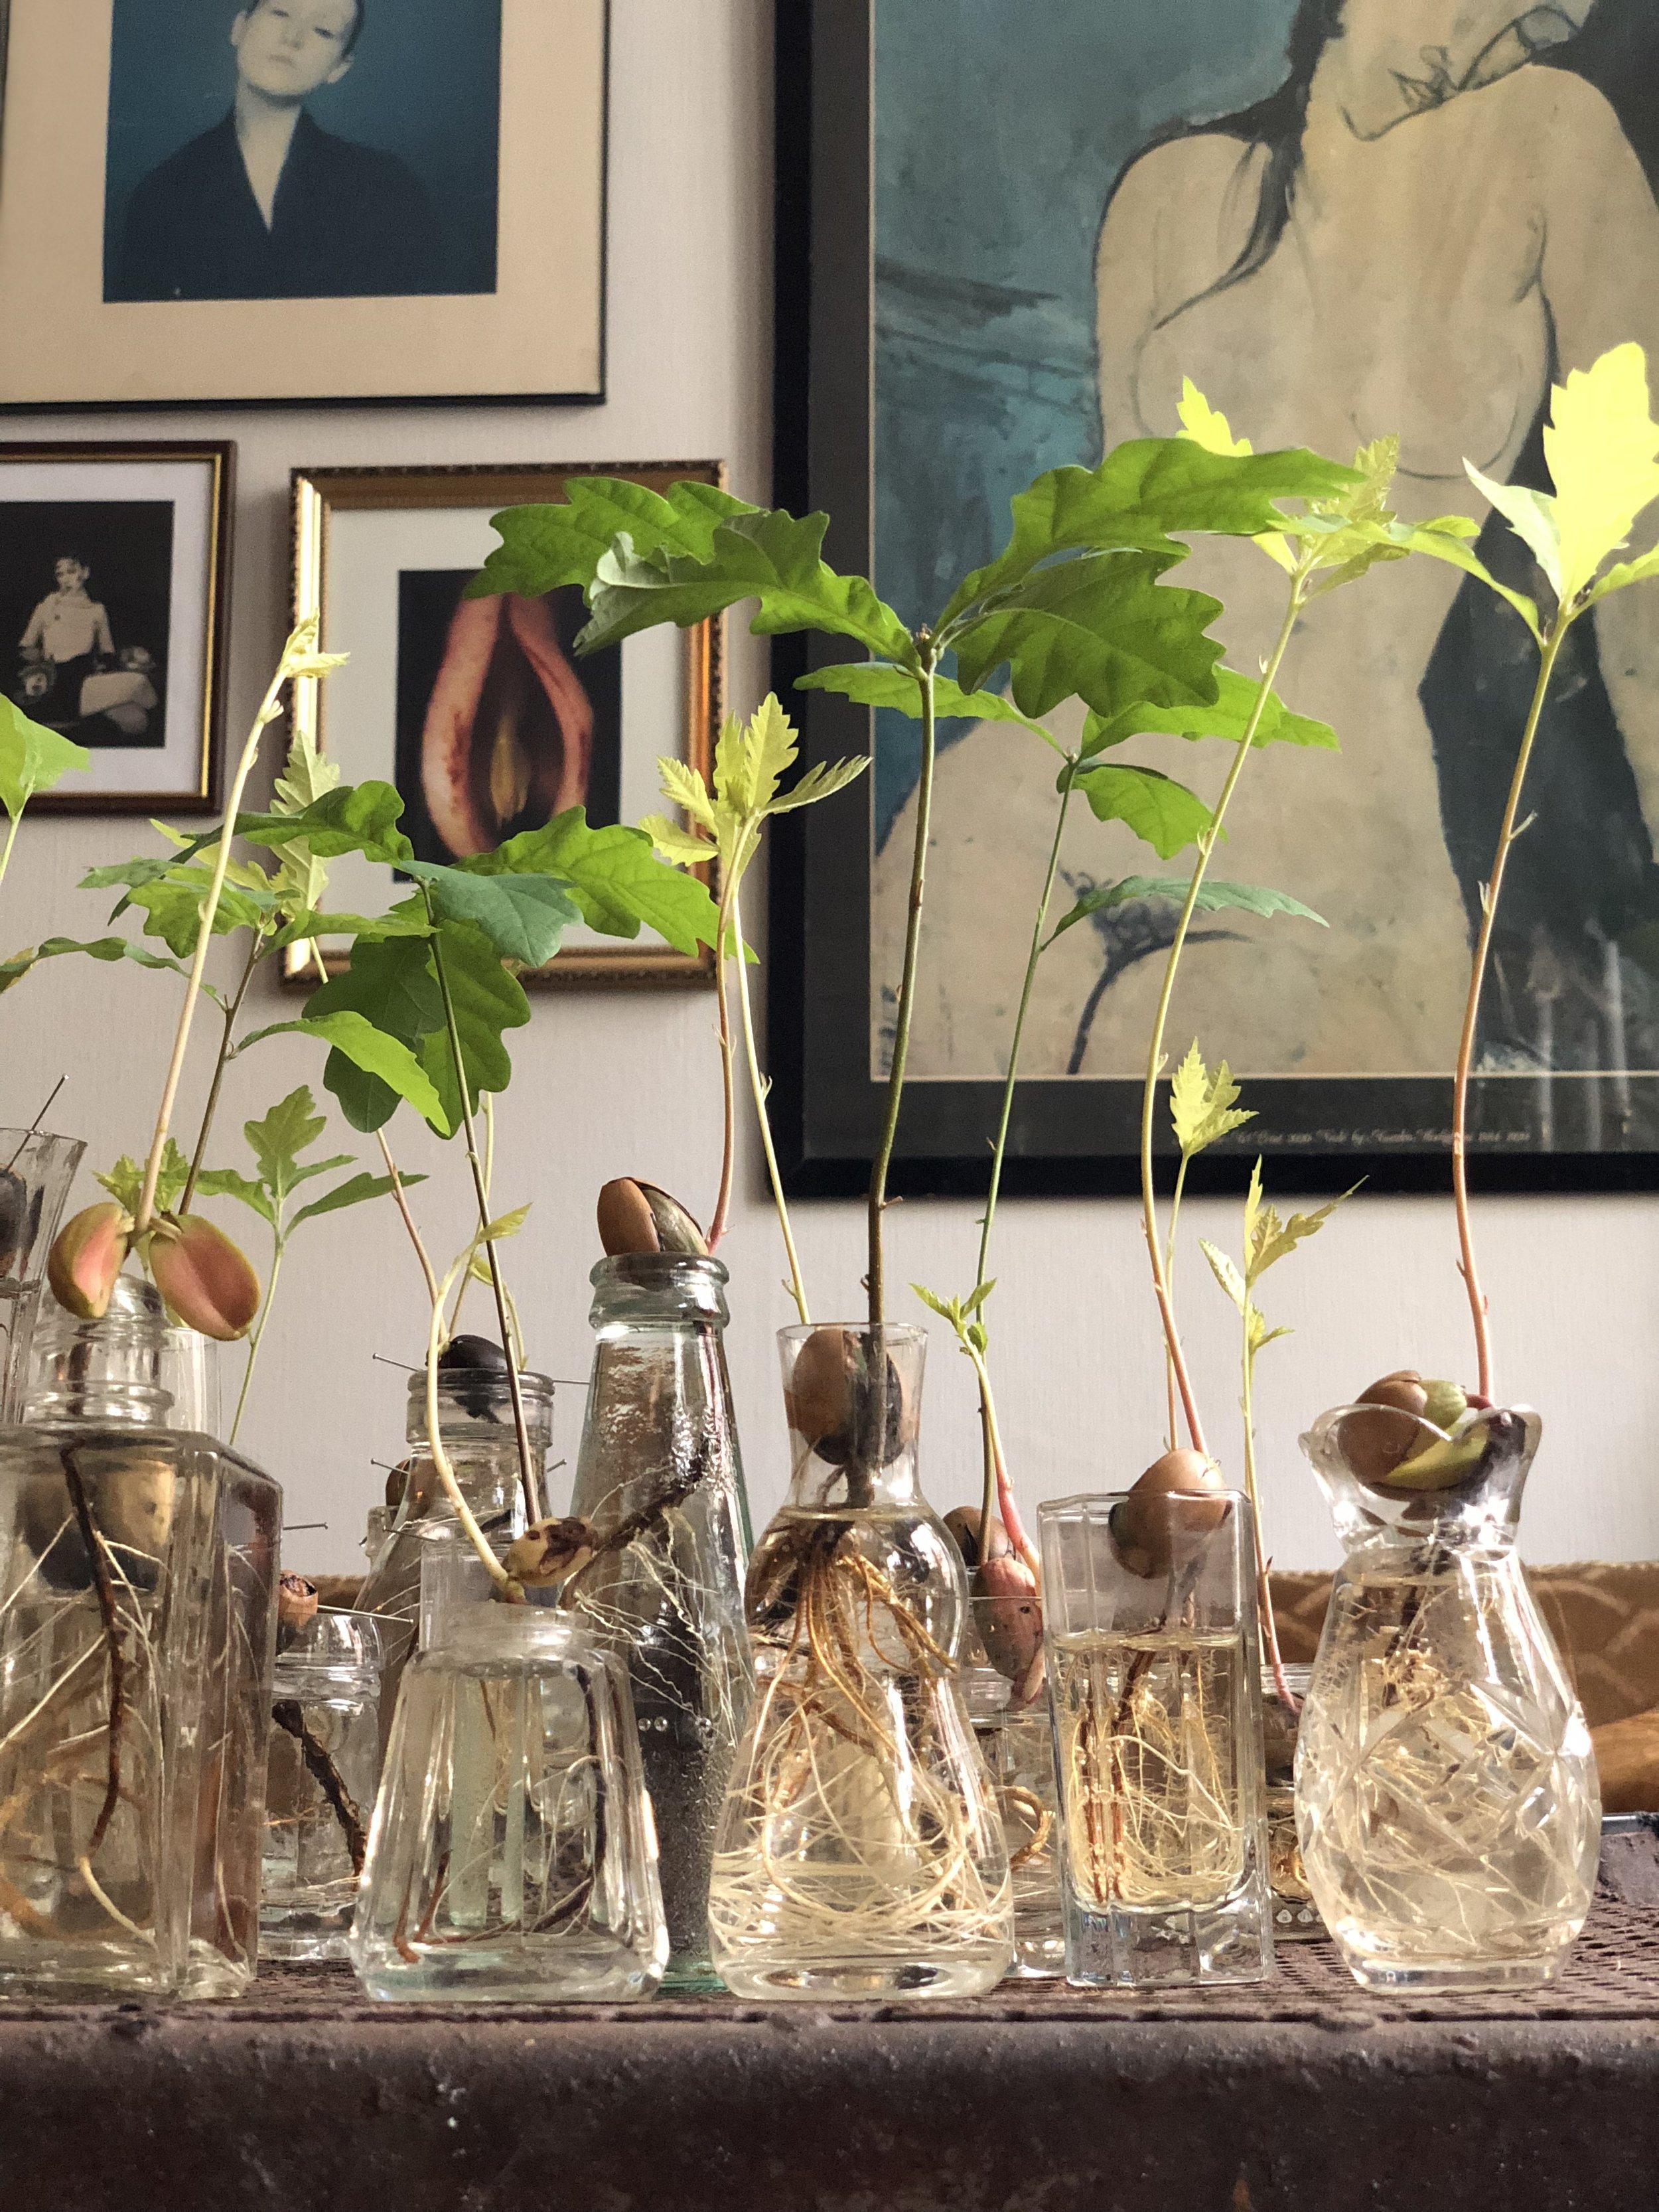 My acorn seedling collection. Malmö 2018